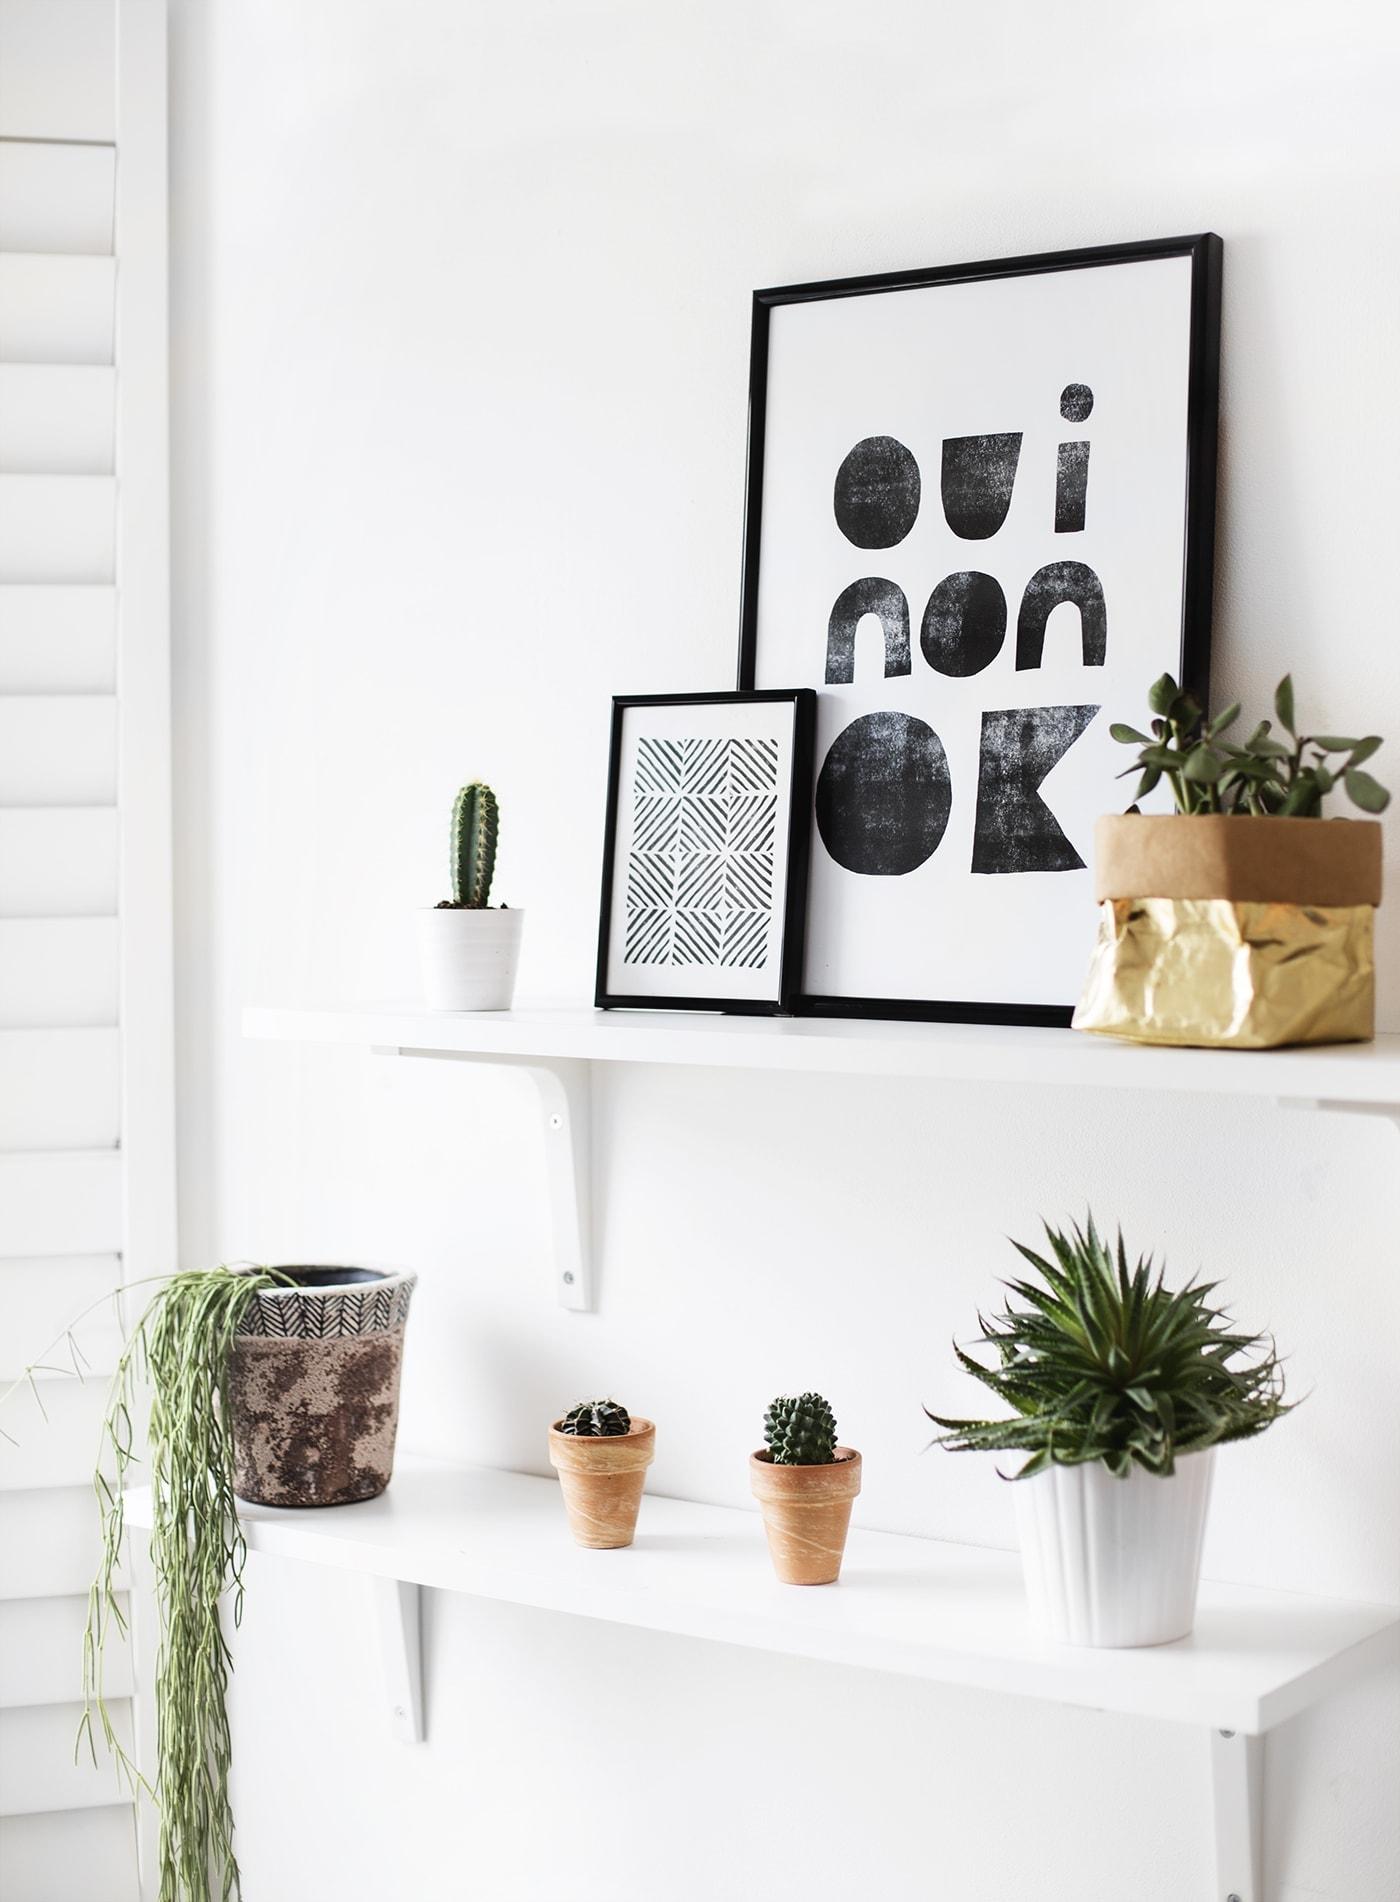 art-in-the-home-affordable-art-fair